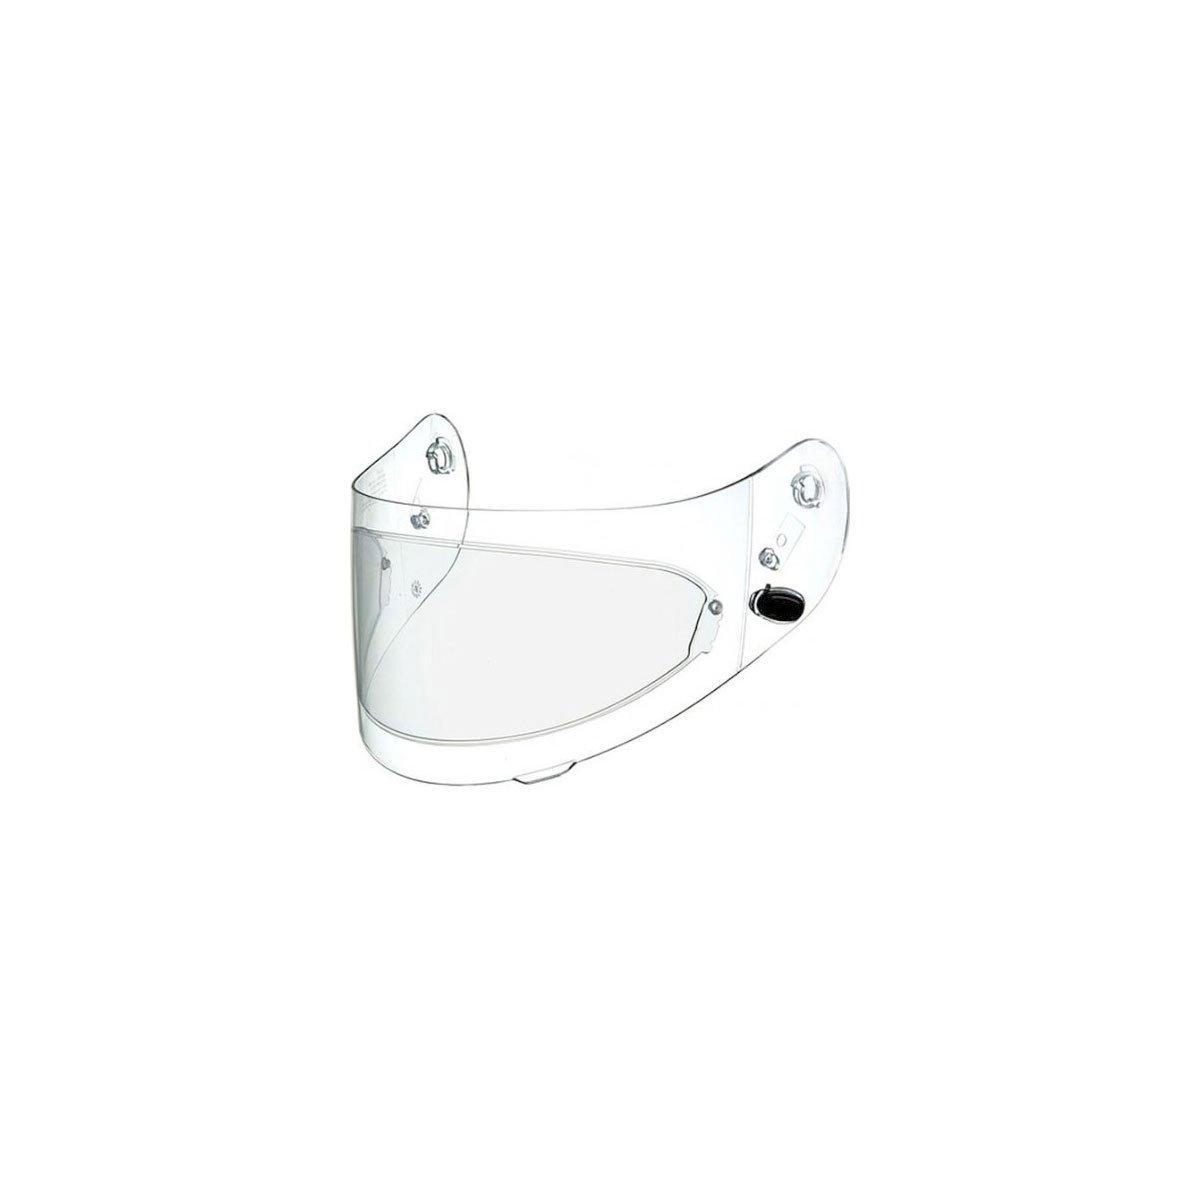 HJC Pinlock Lens Clear 19-110